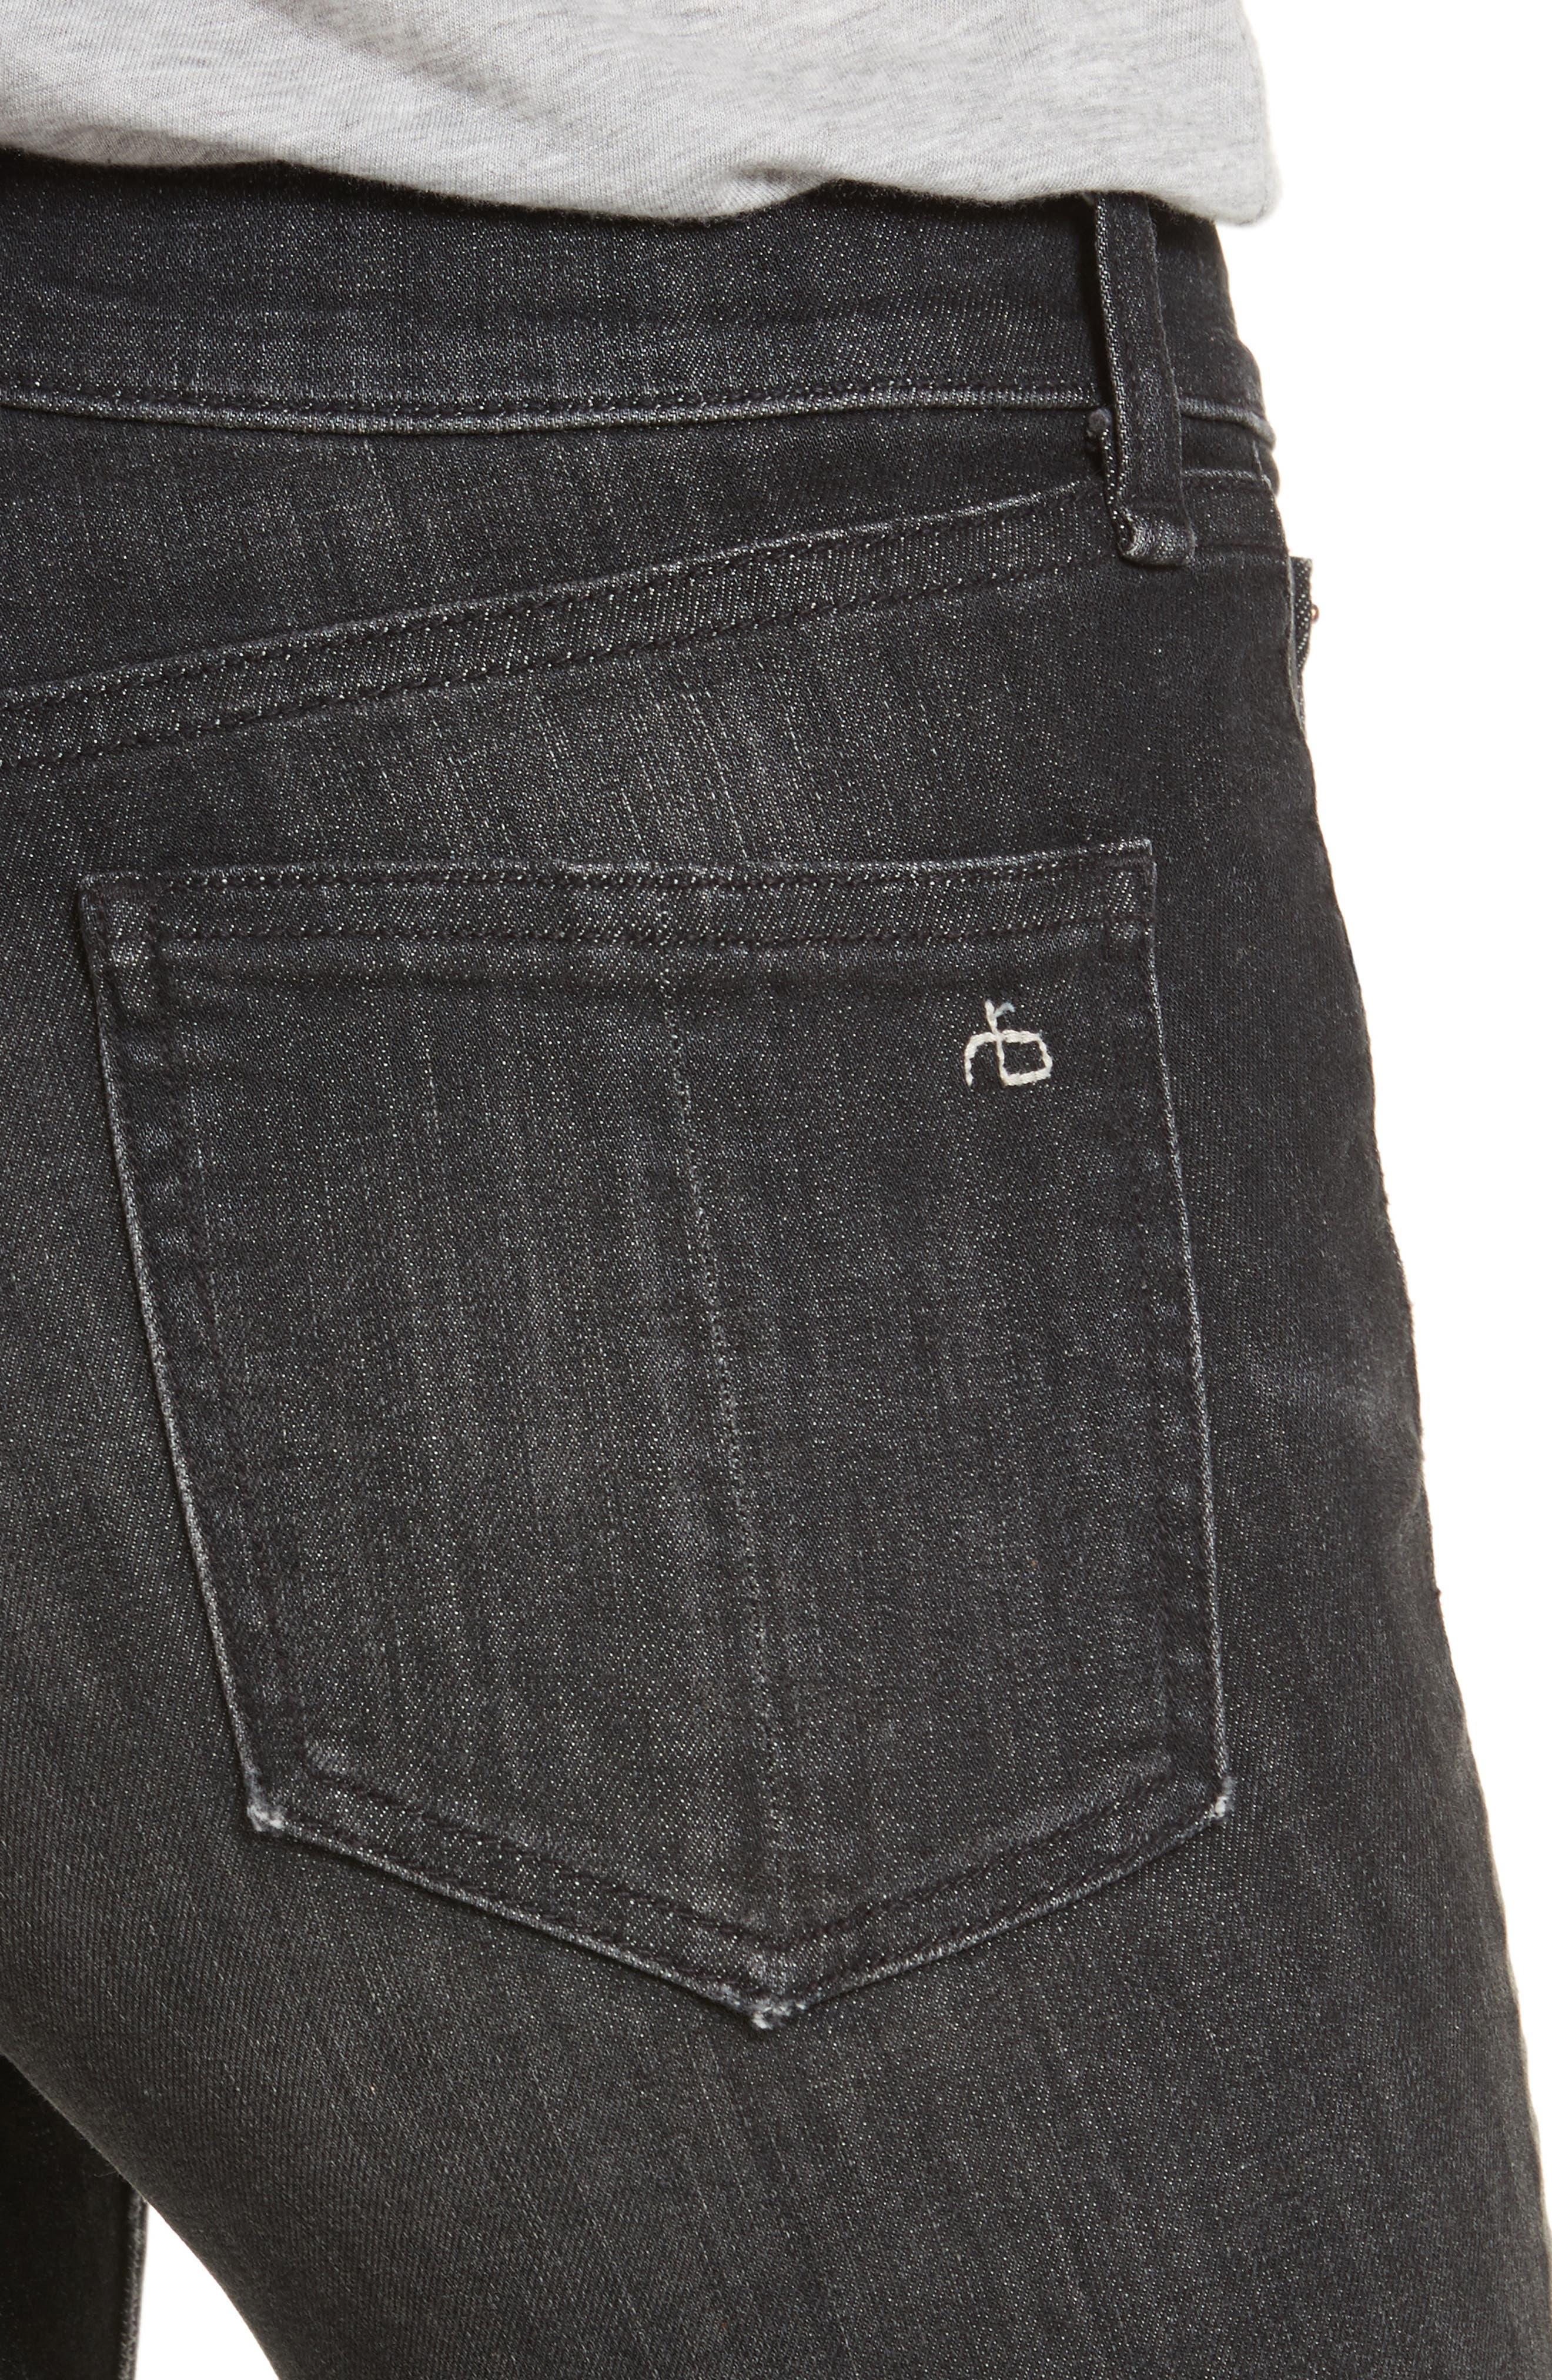 High Waist Ankle Skinny Jeans,                             Alternate thumbnail 4, color,                             Black Lock